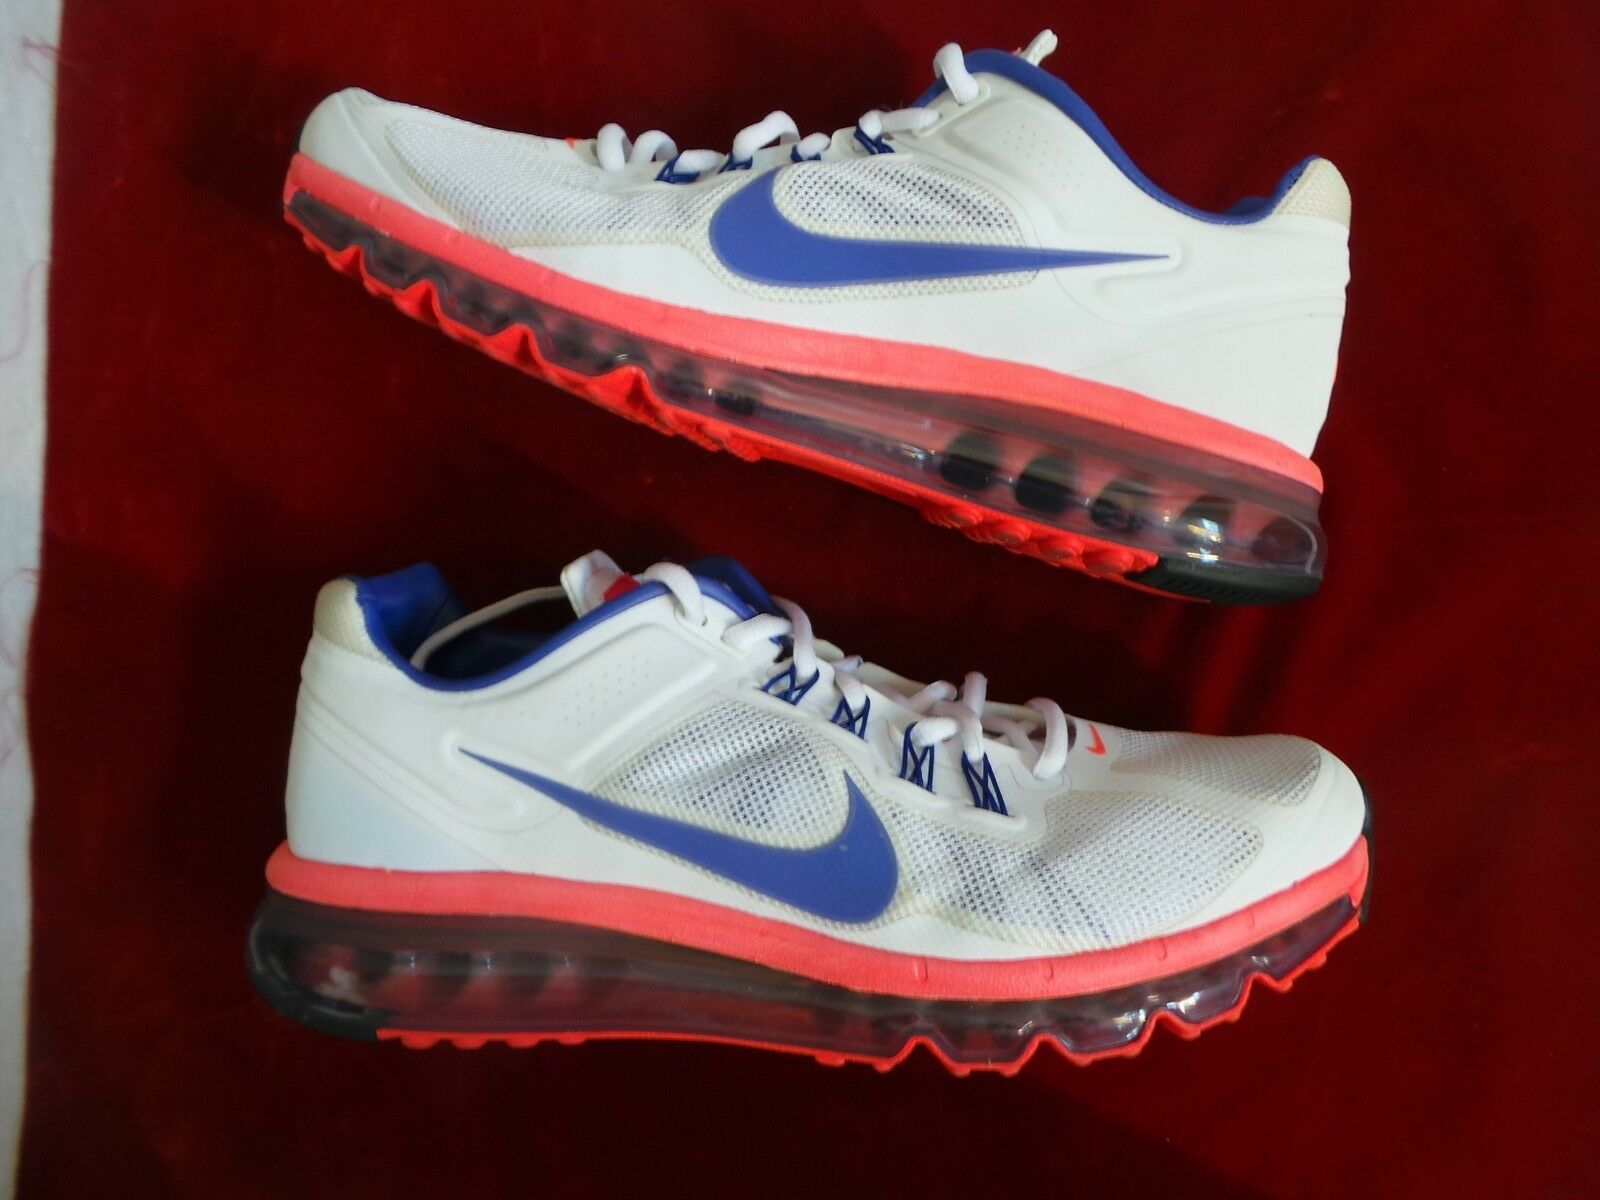 Nike air max 180 2013 92 ext qs quickstrike vapormax biancastro dimensioni vnds